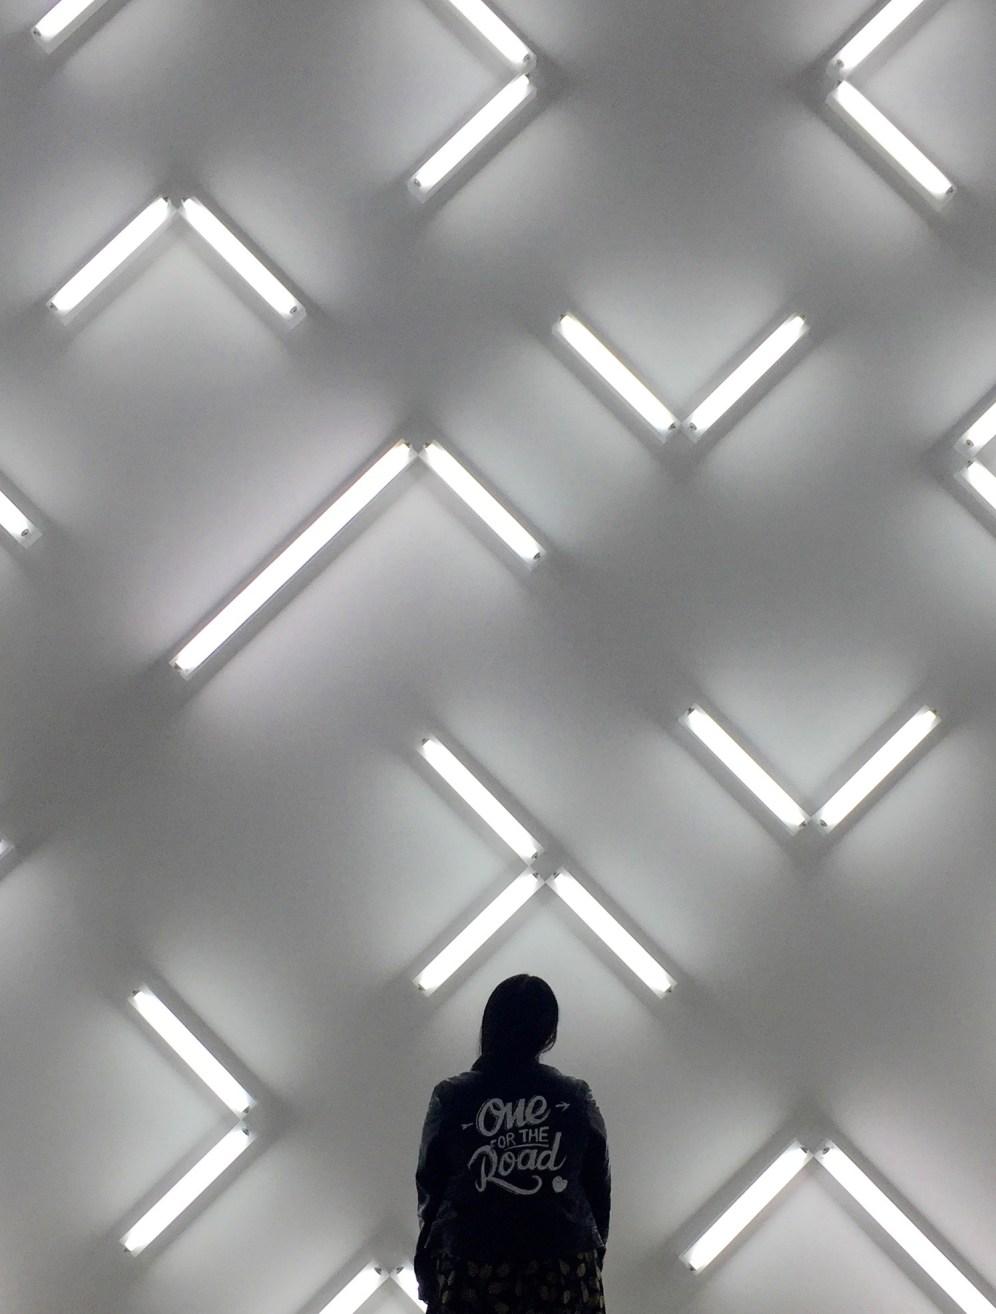 with the Robert Irwin's Light & Space exhibit @ MCASD